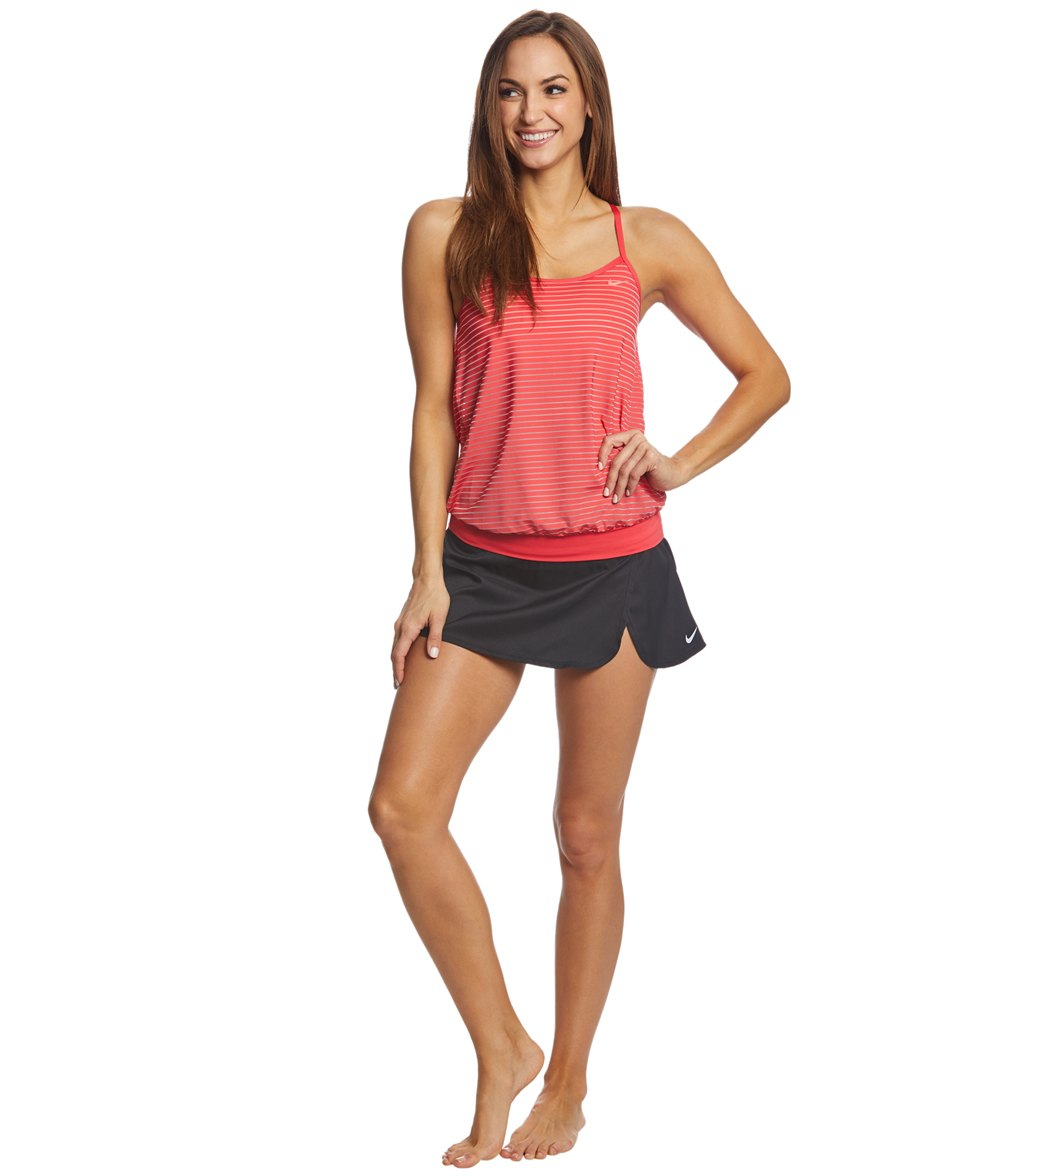 5eaa00d6f7620 Nike Women's Stripe Layered Tankini Top at SwimOutlet.com - Free ...